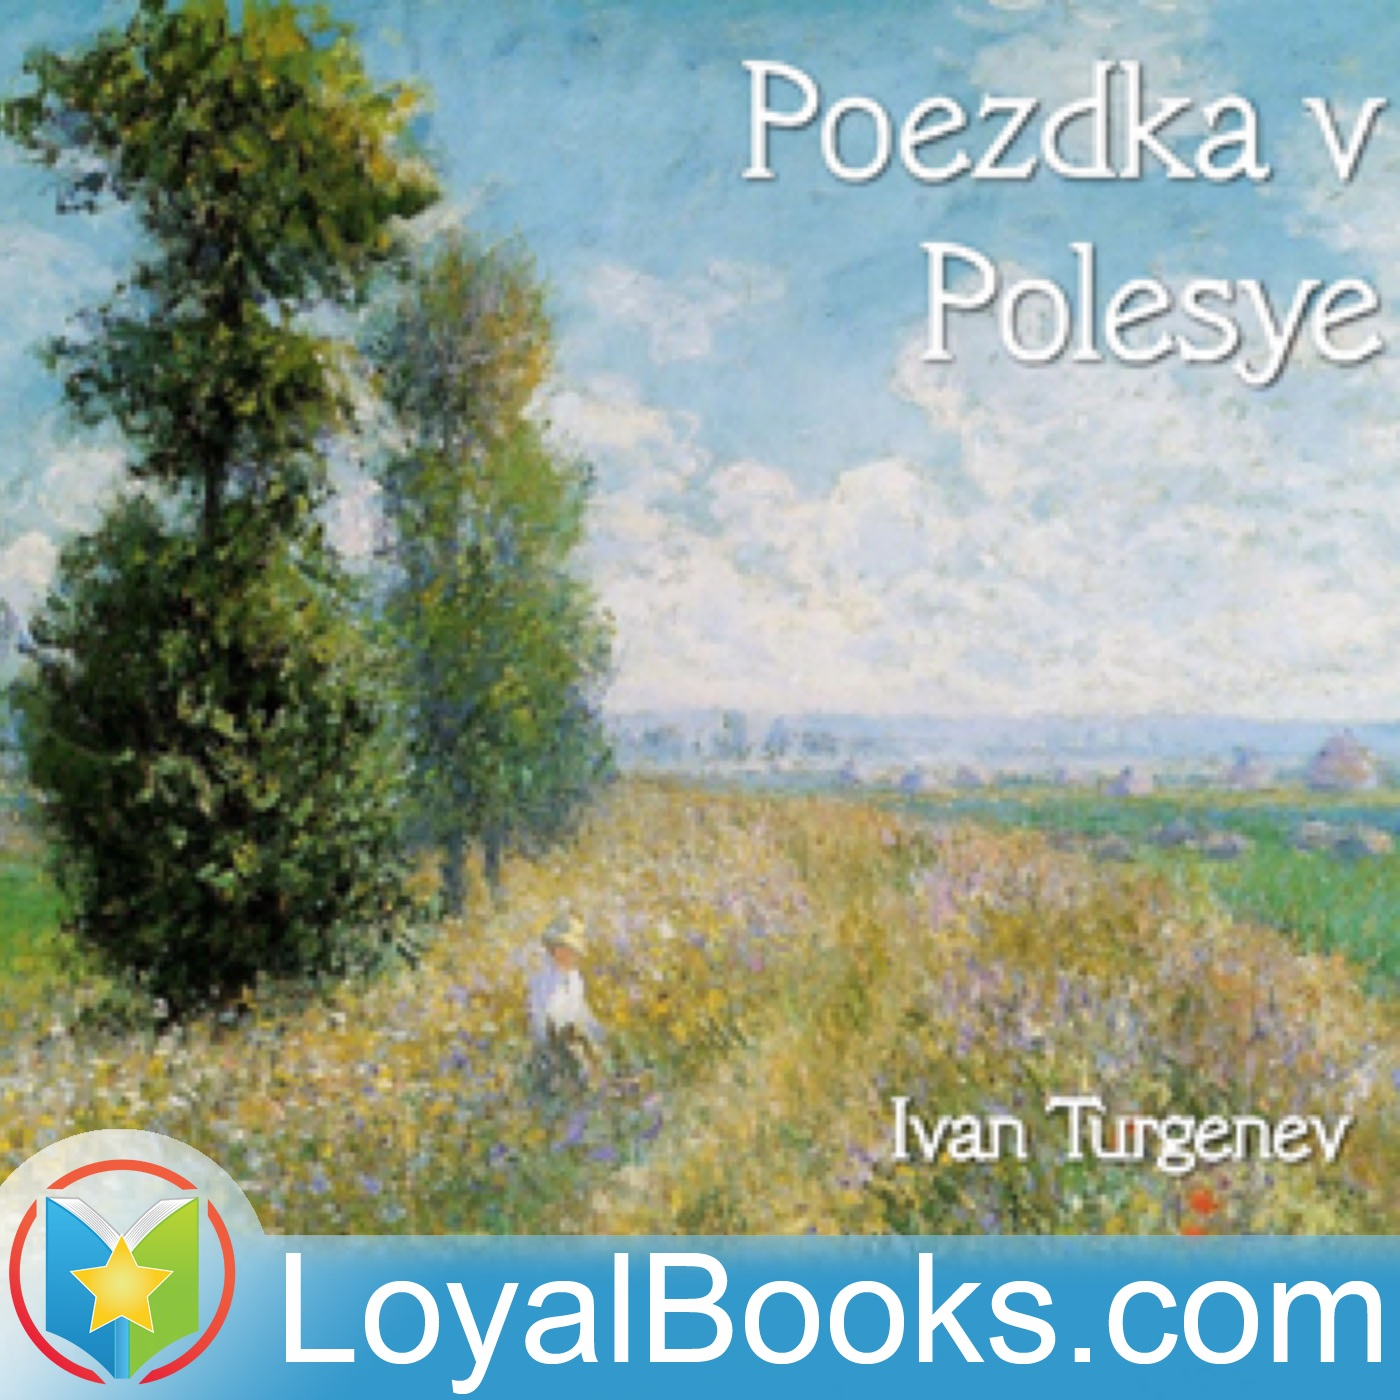 <![CDATA[Poezdka v Polesye by Ivan S. Turgenev]]>